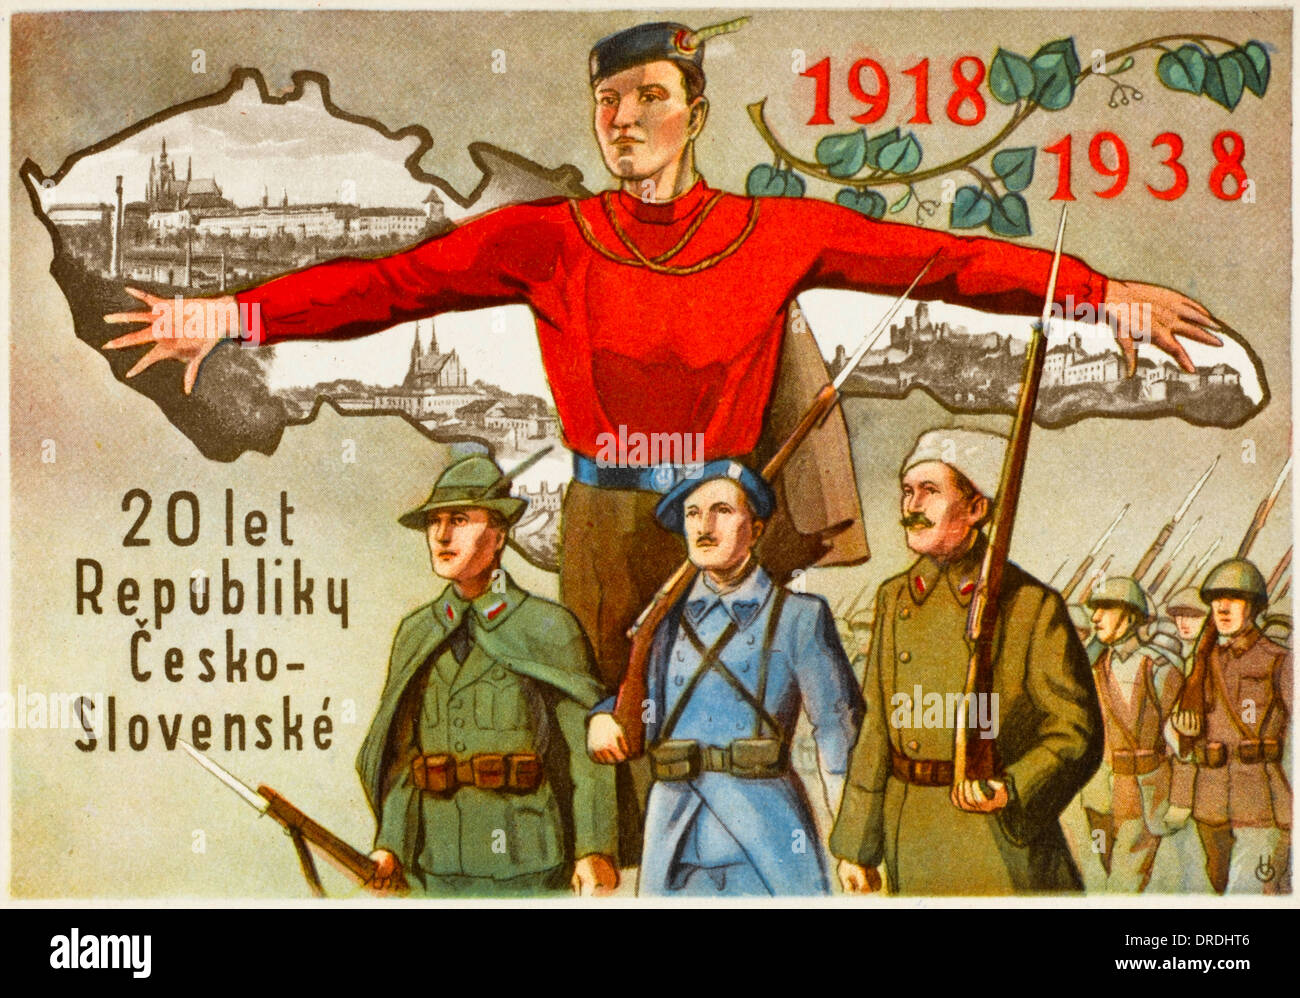 Card celebrating 20 years of Czechoslovakia - Stock Image